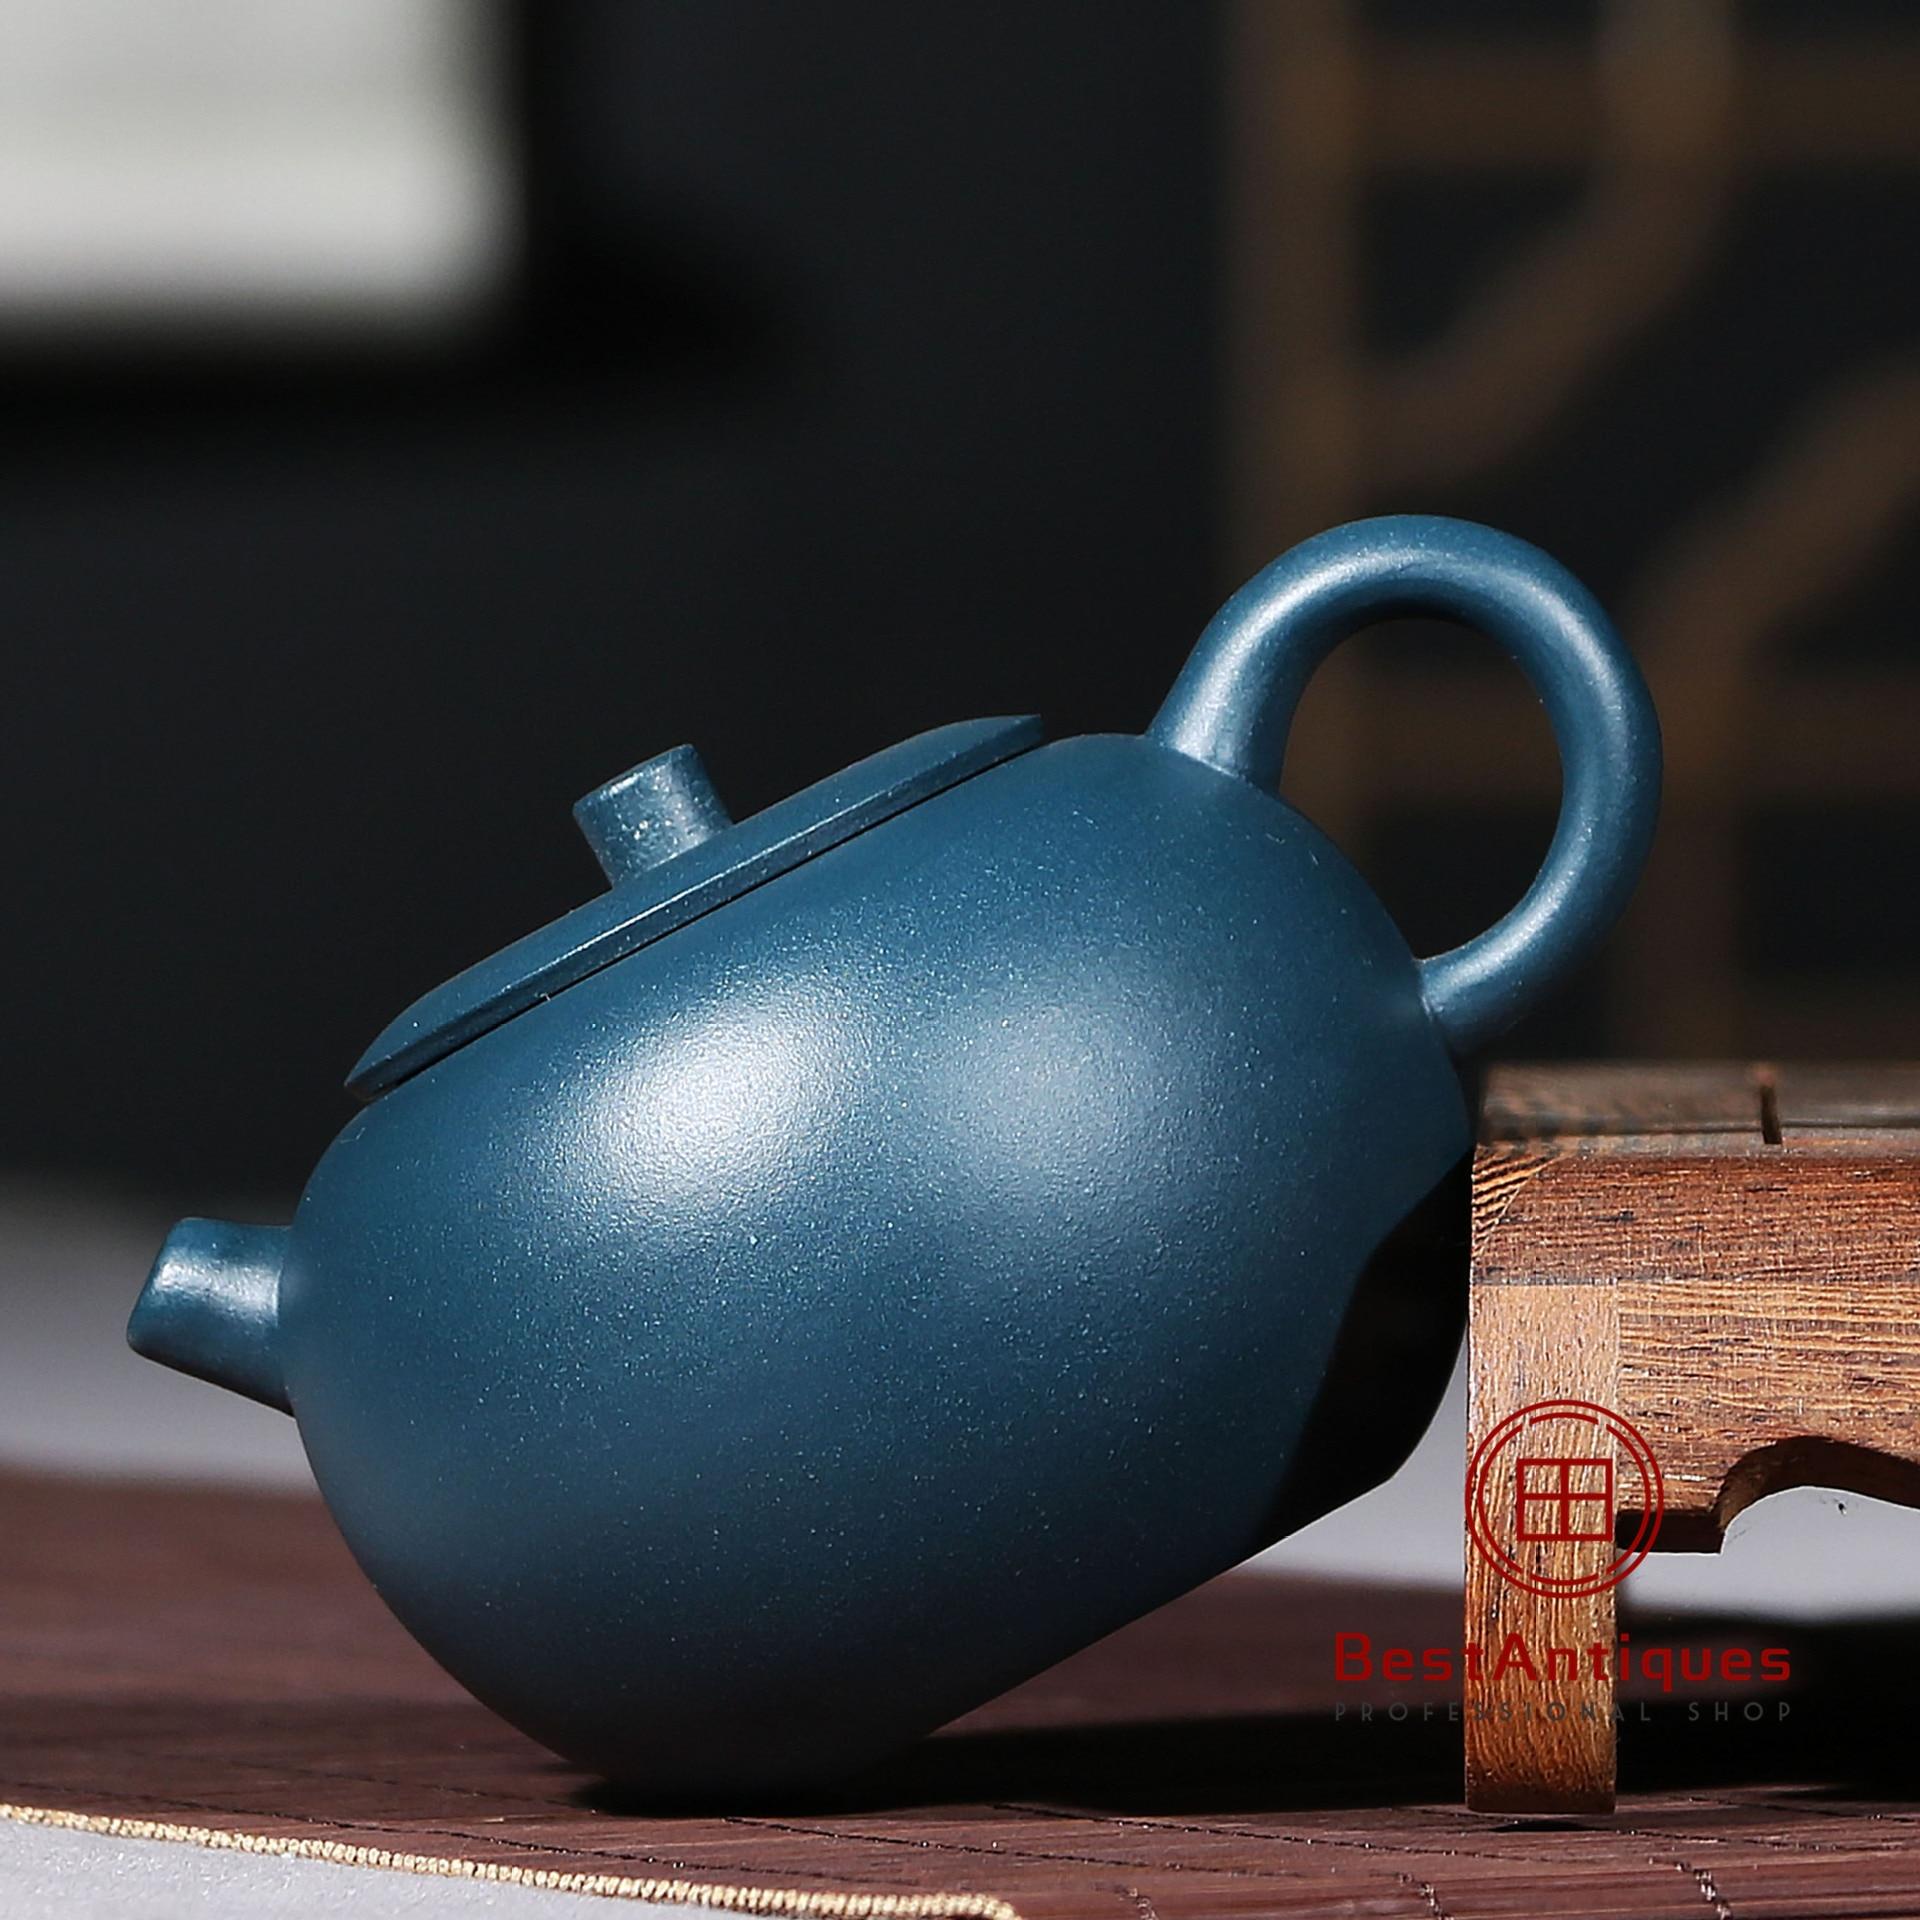 Chinese Yixing zisha teapot handmade purple clay lvni xishi teapot 200cc